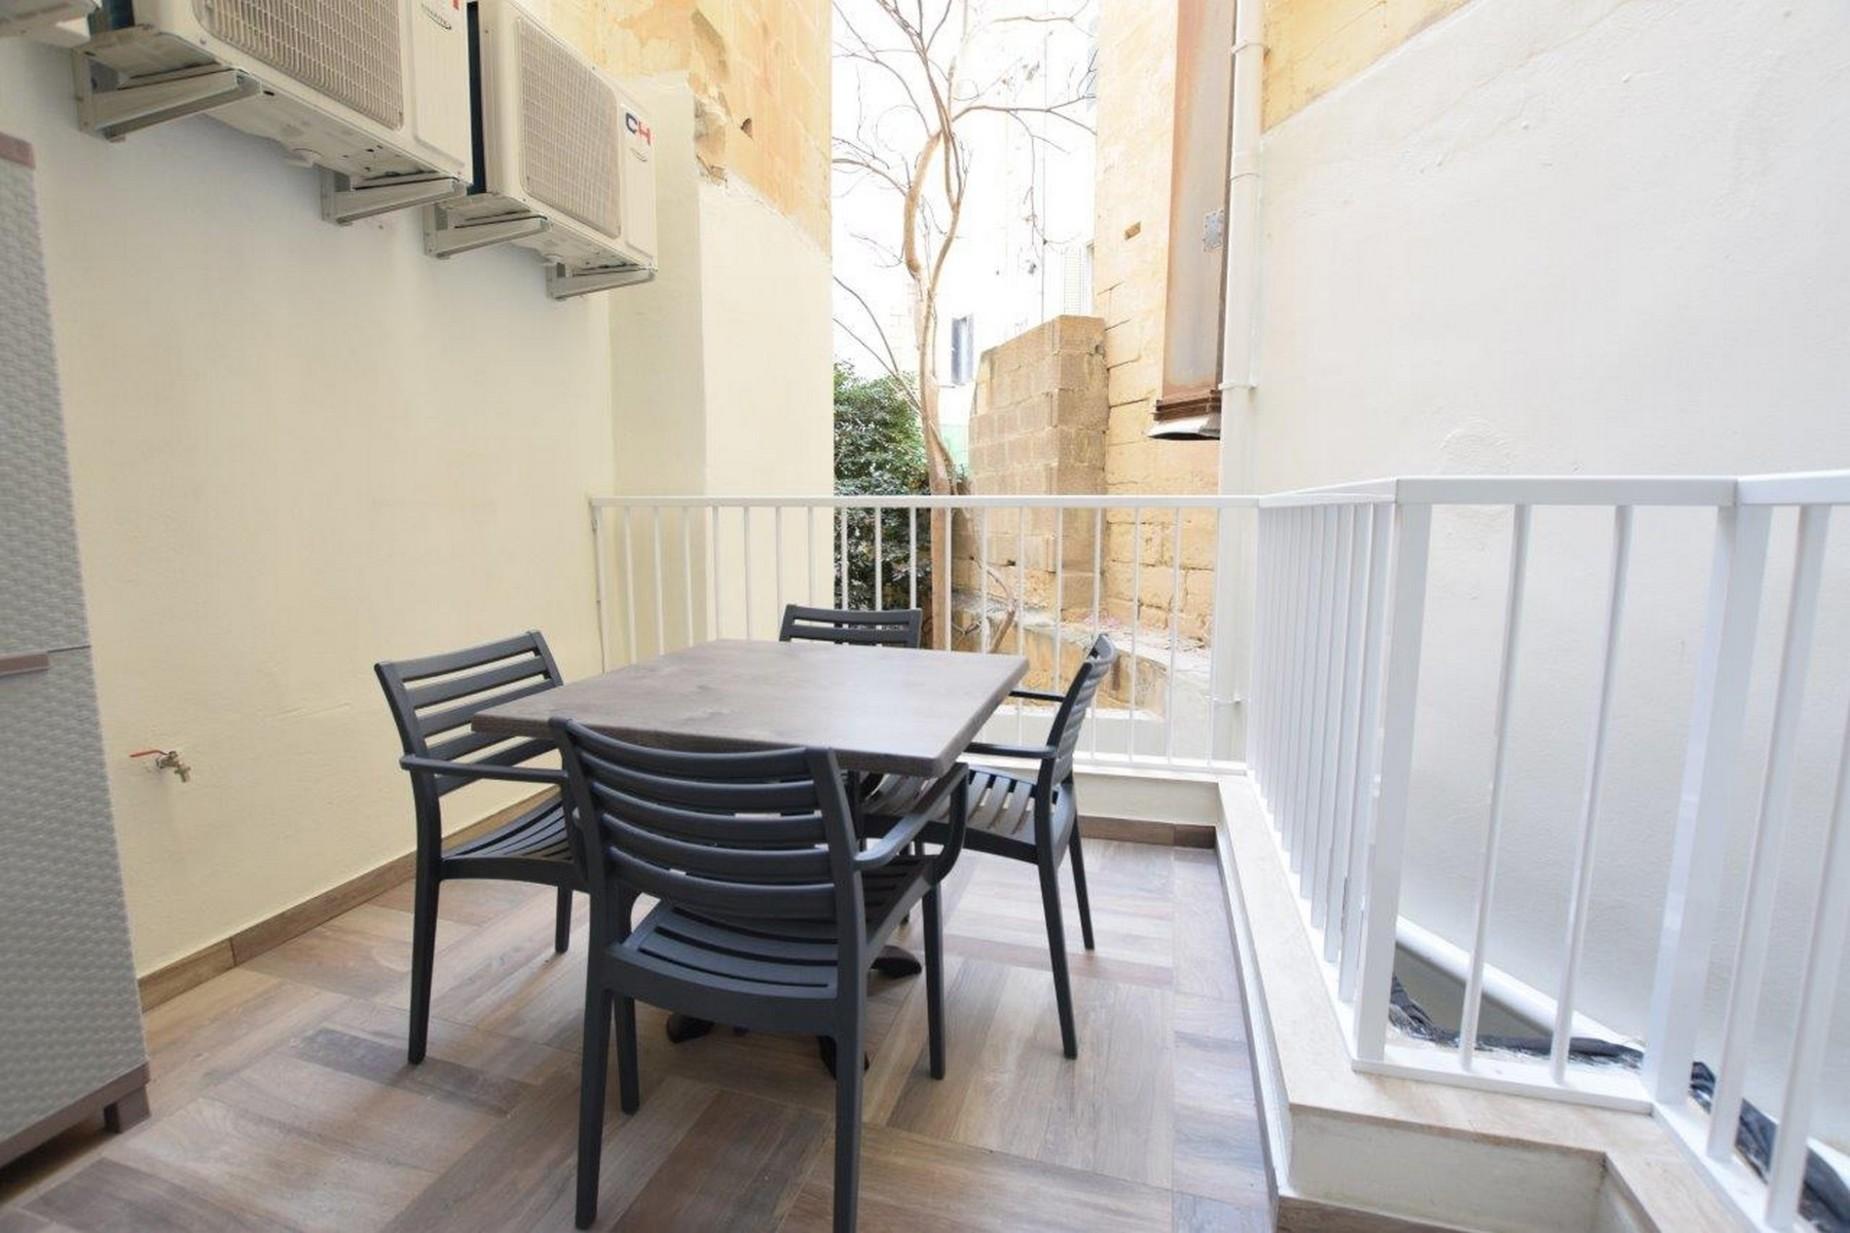 3 bed Apartment For Rent in Sliema, Sliema - thumb 15